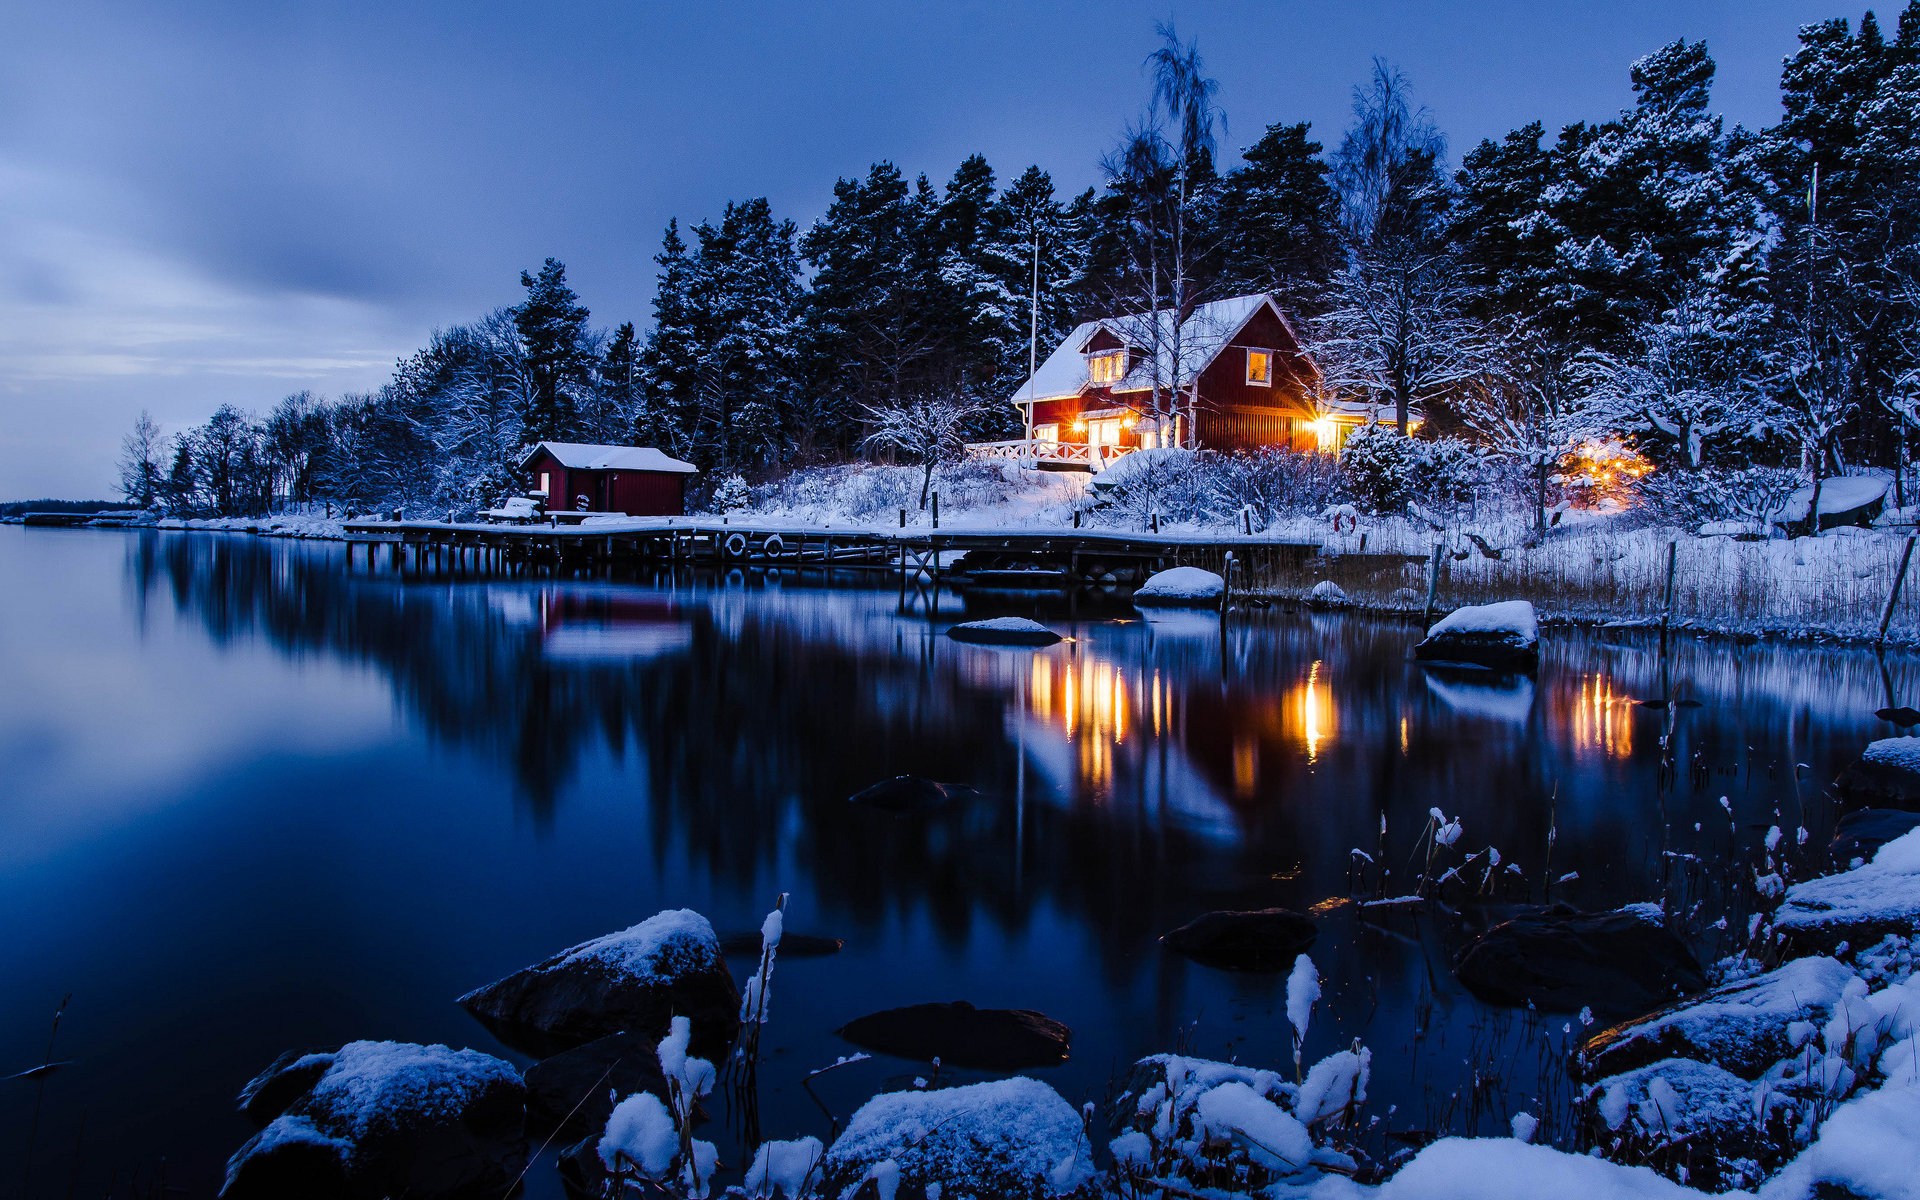 Beautiful Winter Night Wallpaper Freetopwallpapercom 1920x1200